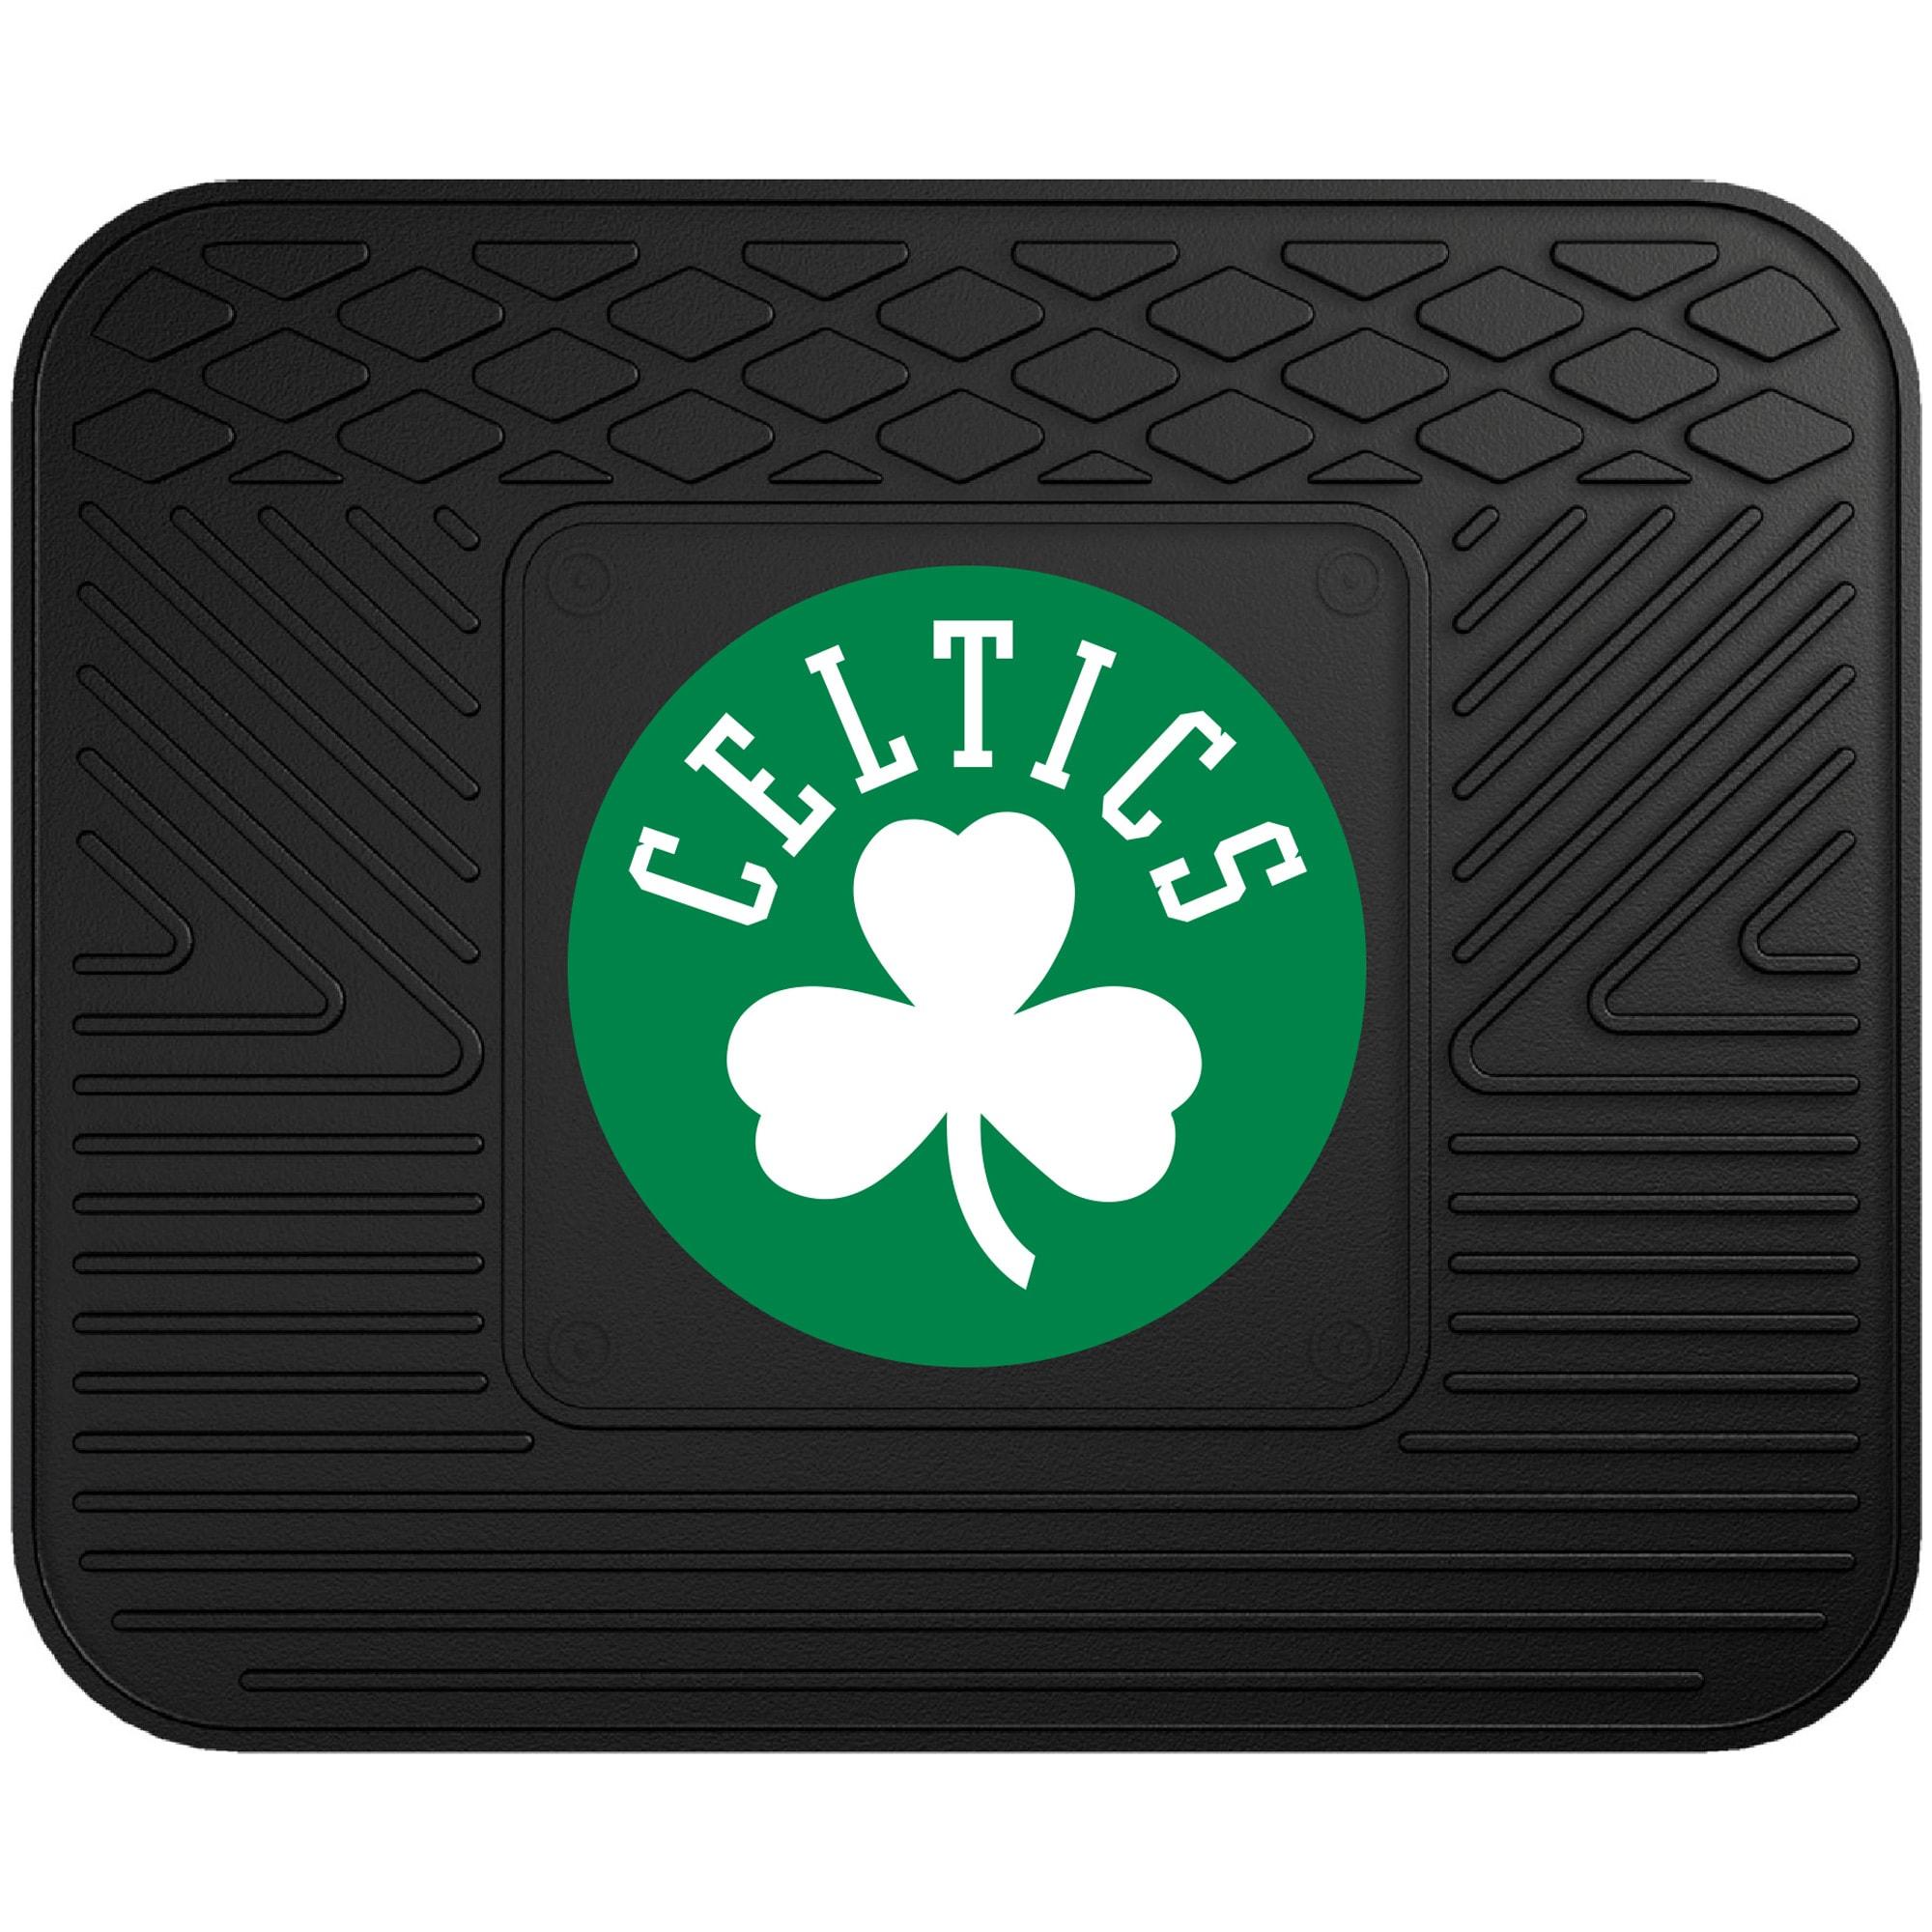 "Boston Celtics 17"" x 14"" Utility Mat"